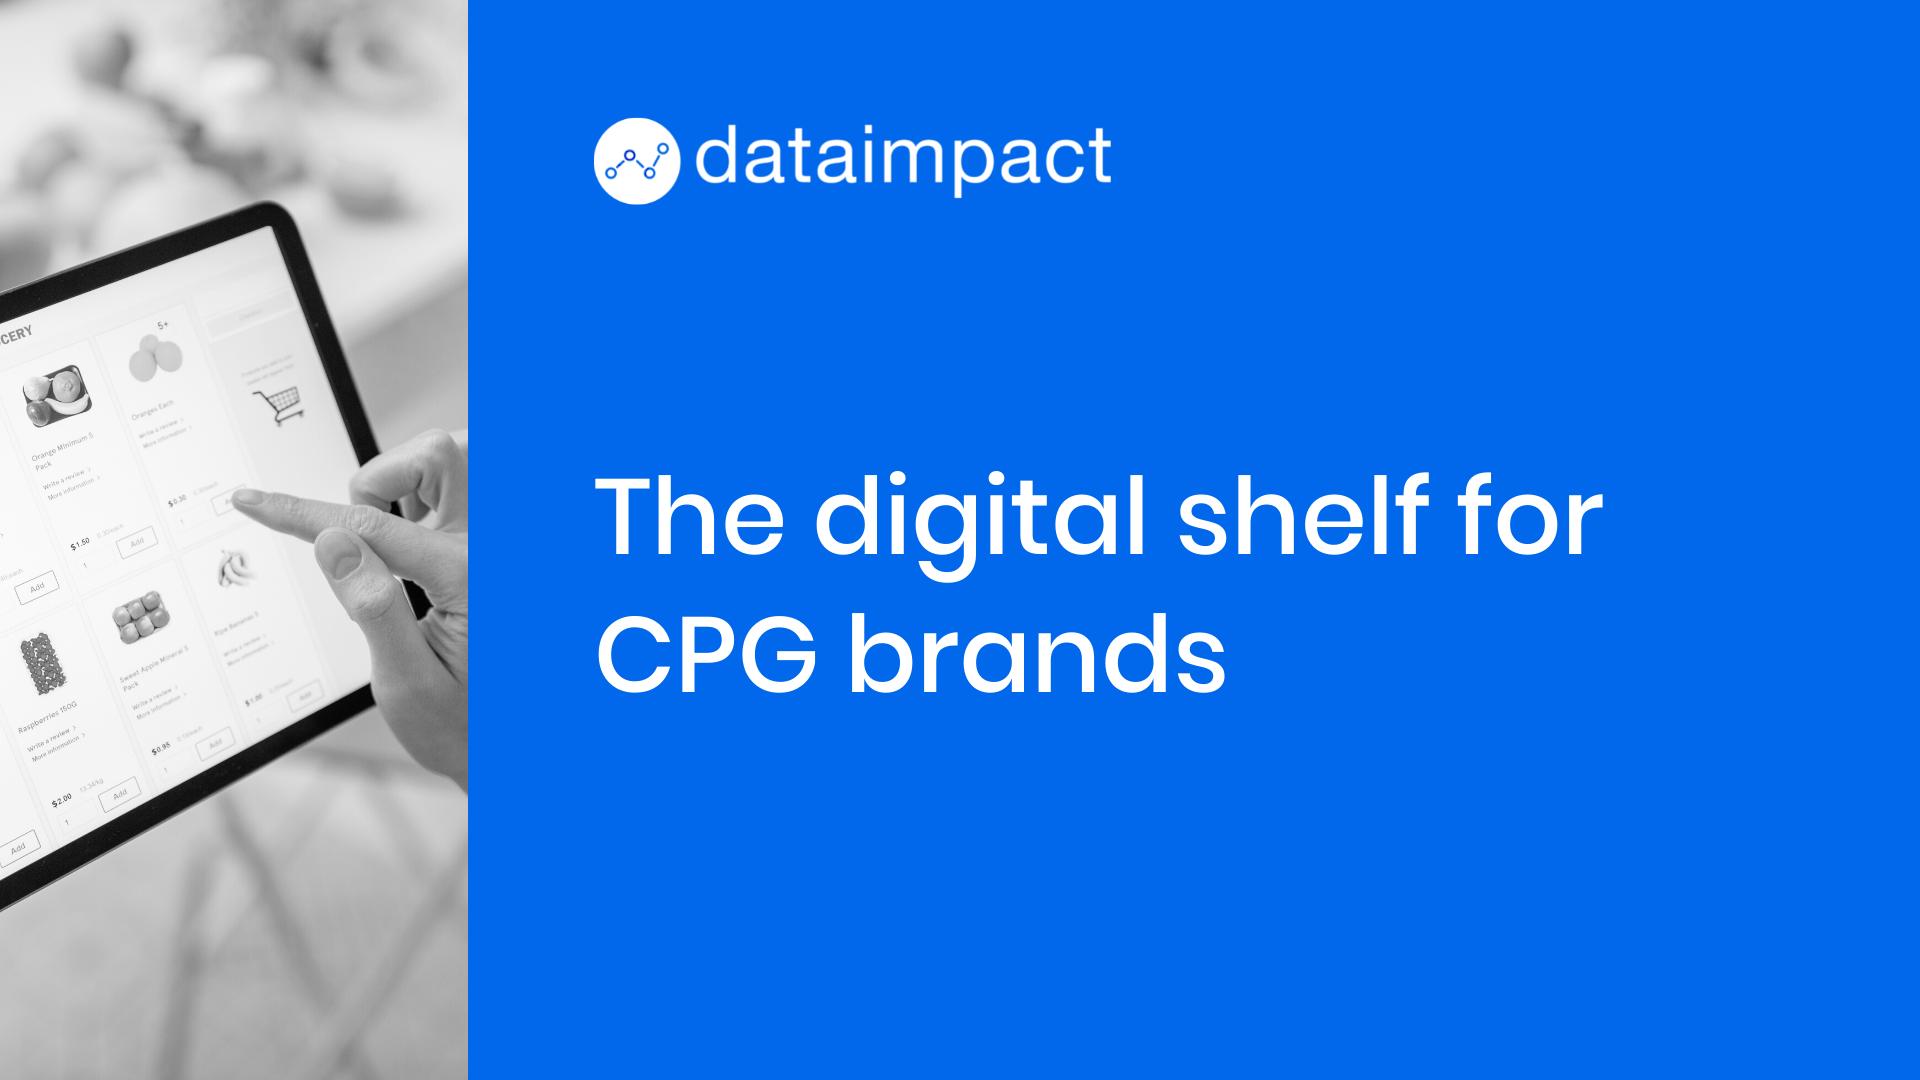 digital shelf brands CPG